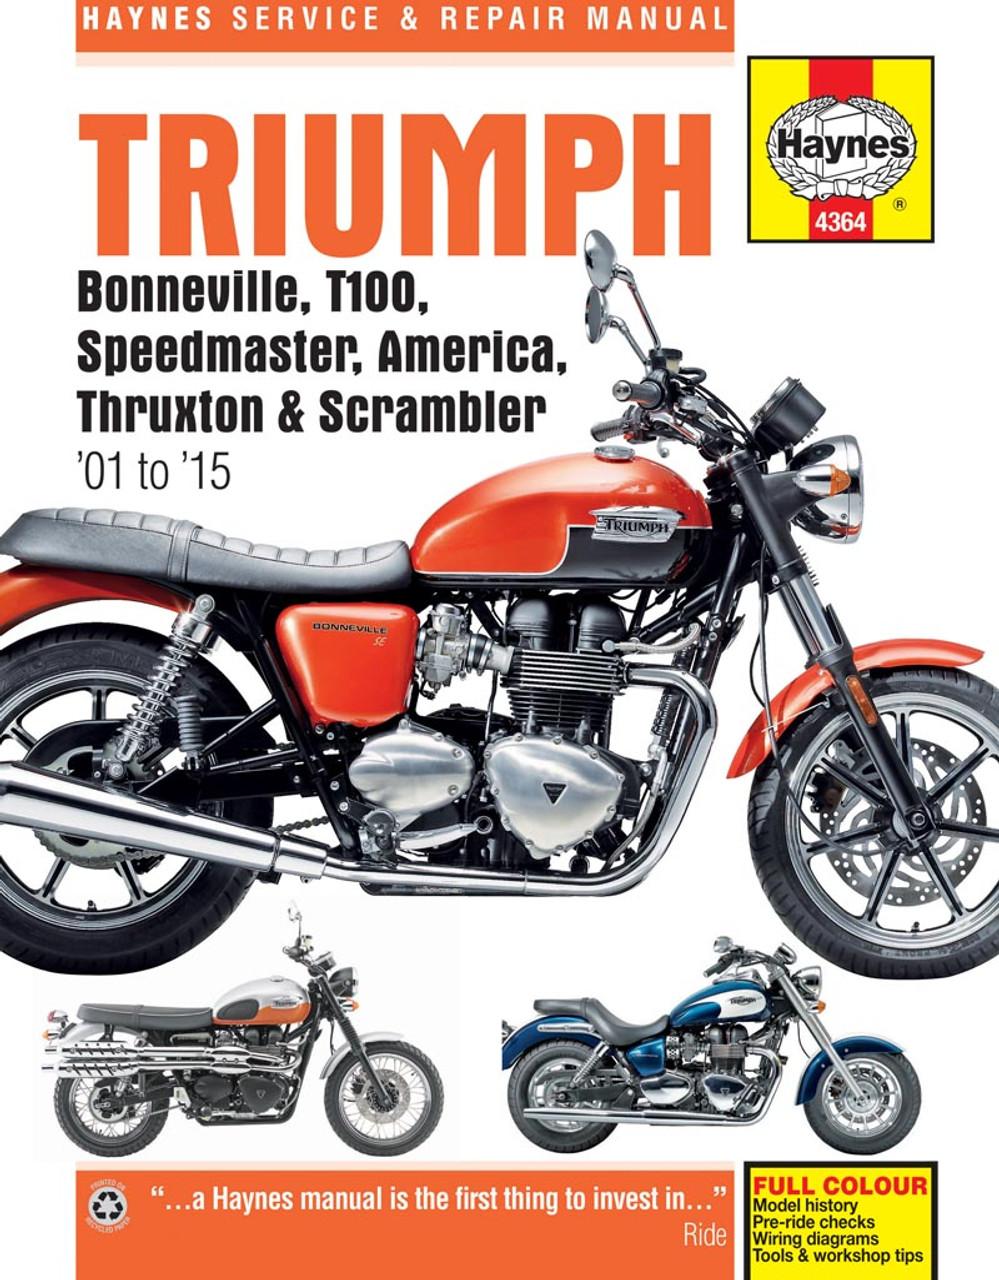 triumph bonneville, t100, speedmaster, america, thruxton and scrabmler 2001 2015 workshop manual2001 Triumph Wiring Diagram 573d7df37aa08a3bc555789404bd06f5 #7